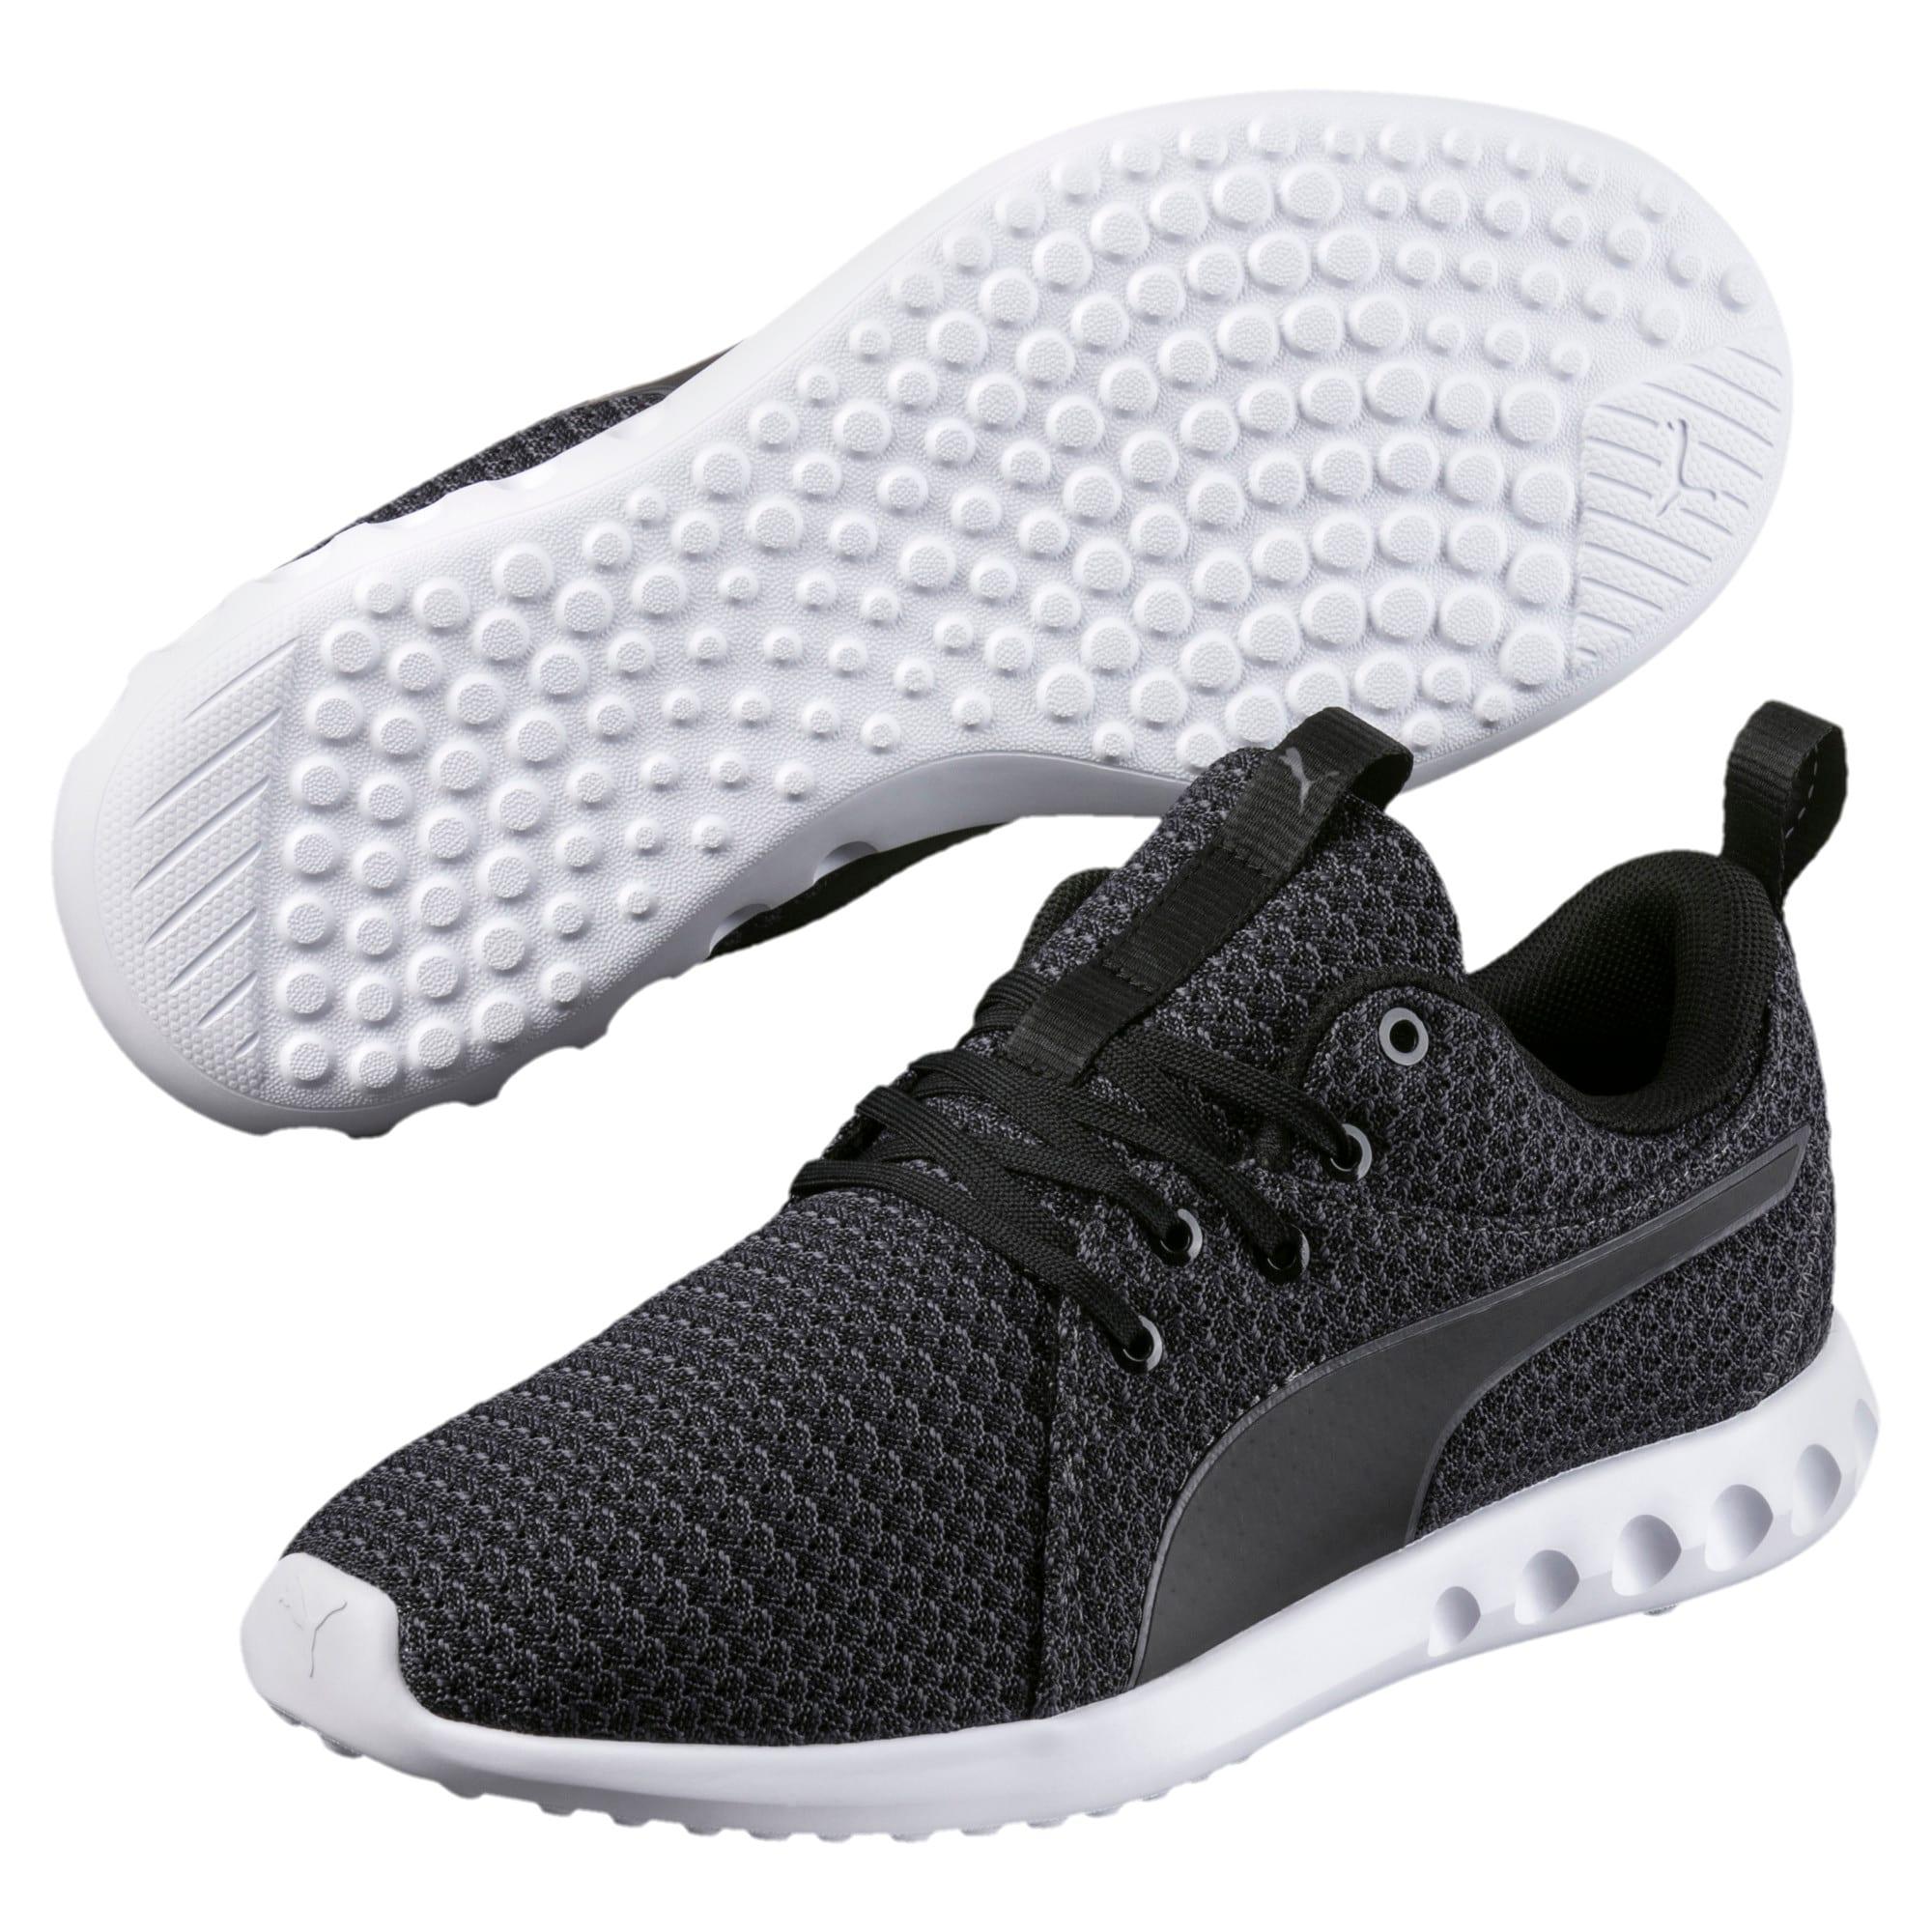 Thumbnail 2 of Carson 2 Knit Women's Running Shoes, Puma Black-Periscope, medium